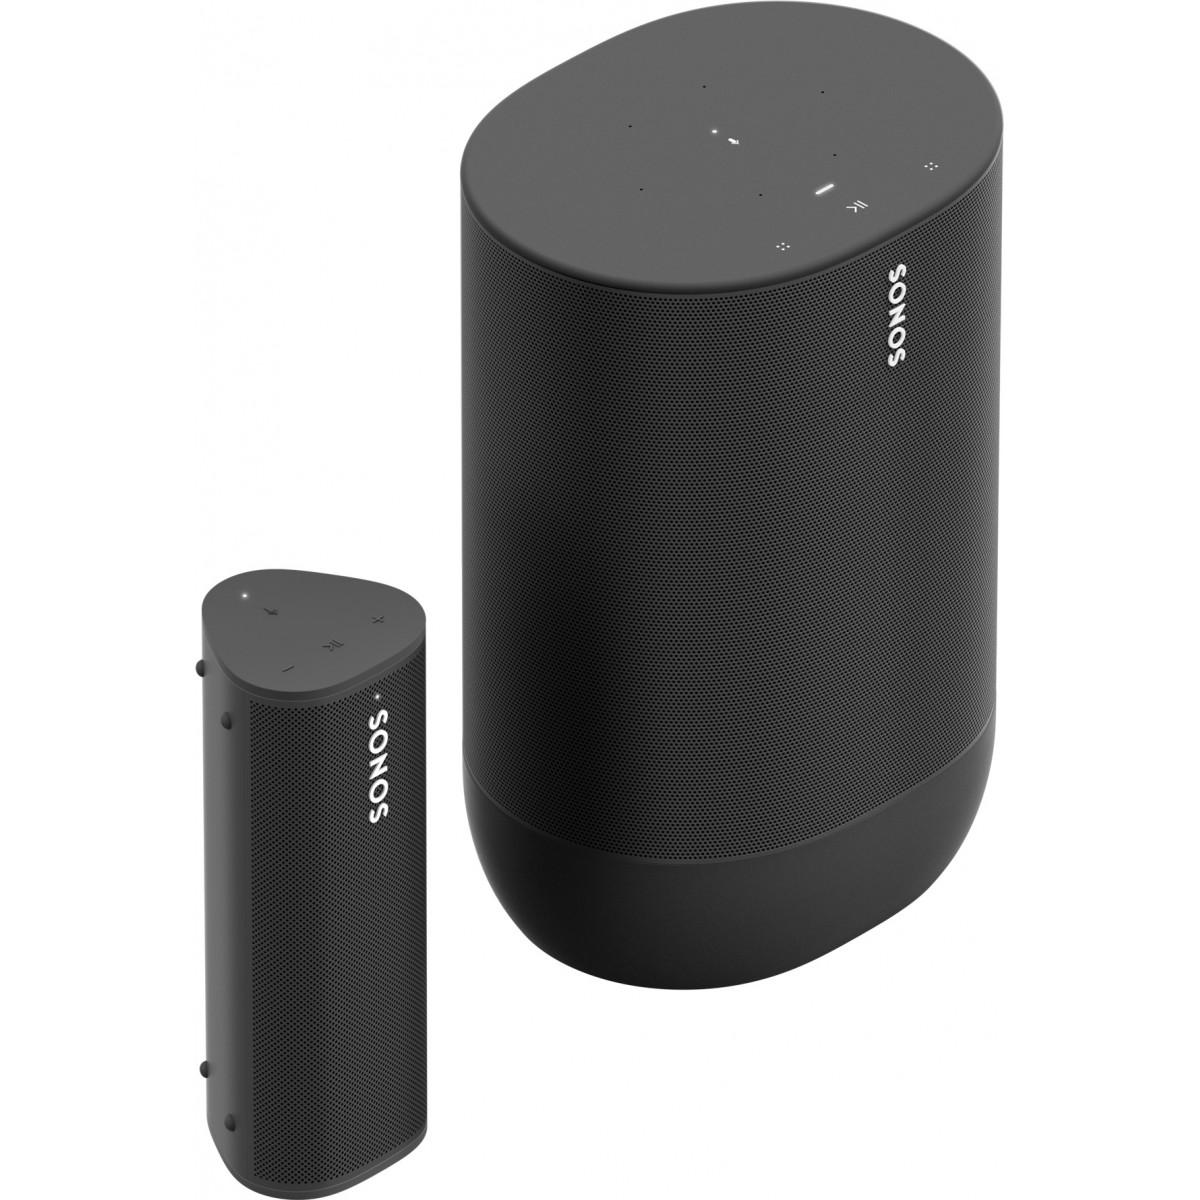 Tragbarer Bluetooth- und WiFi-Lautsprecher Roam